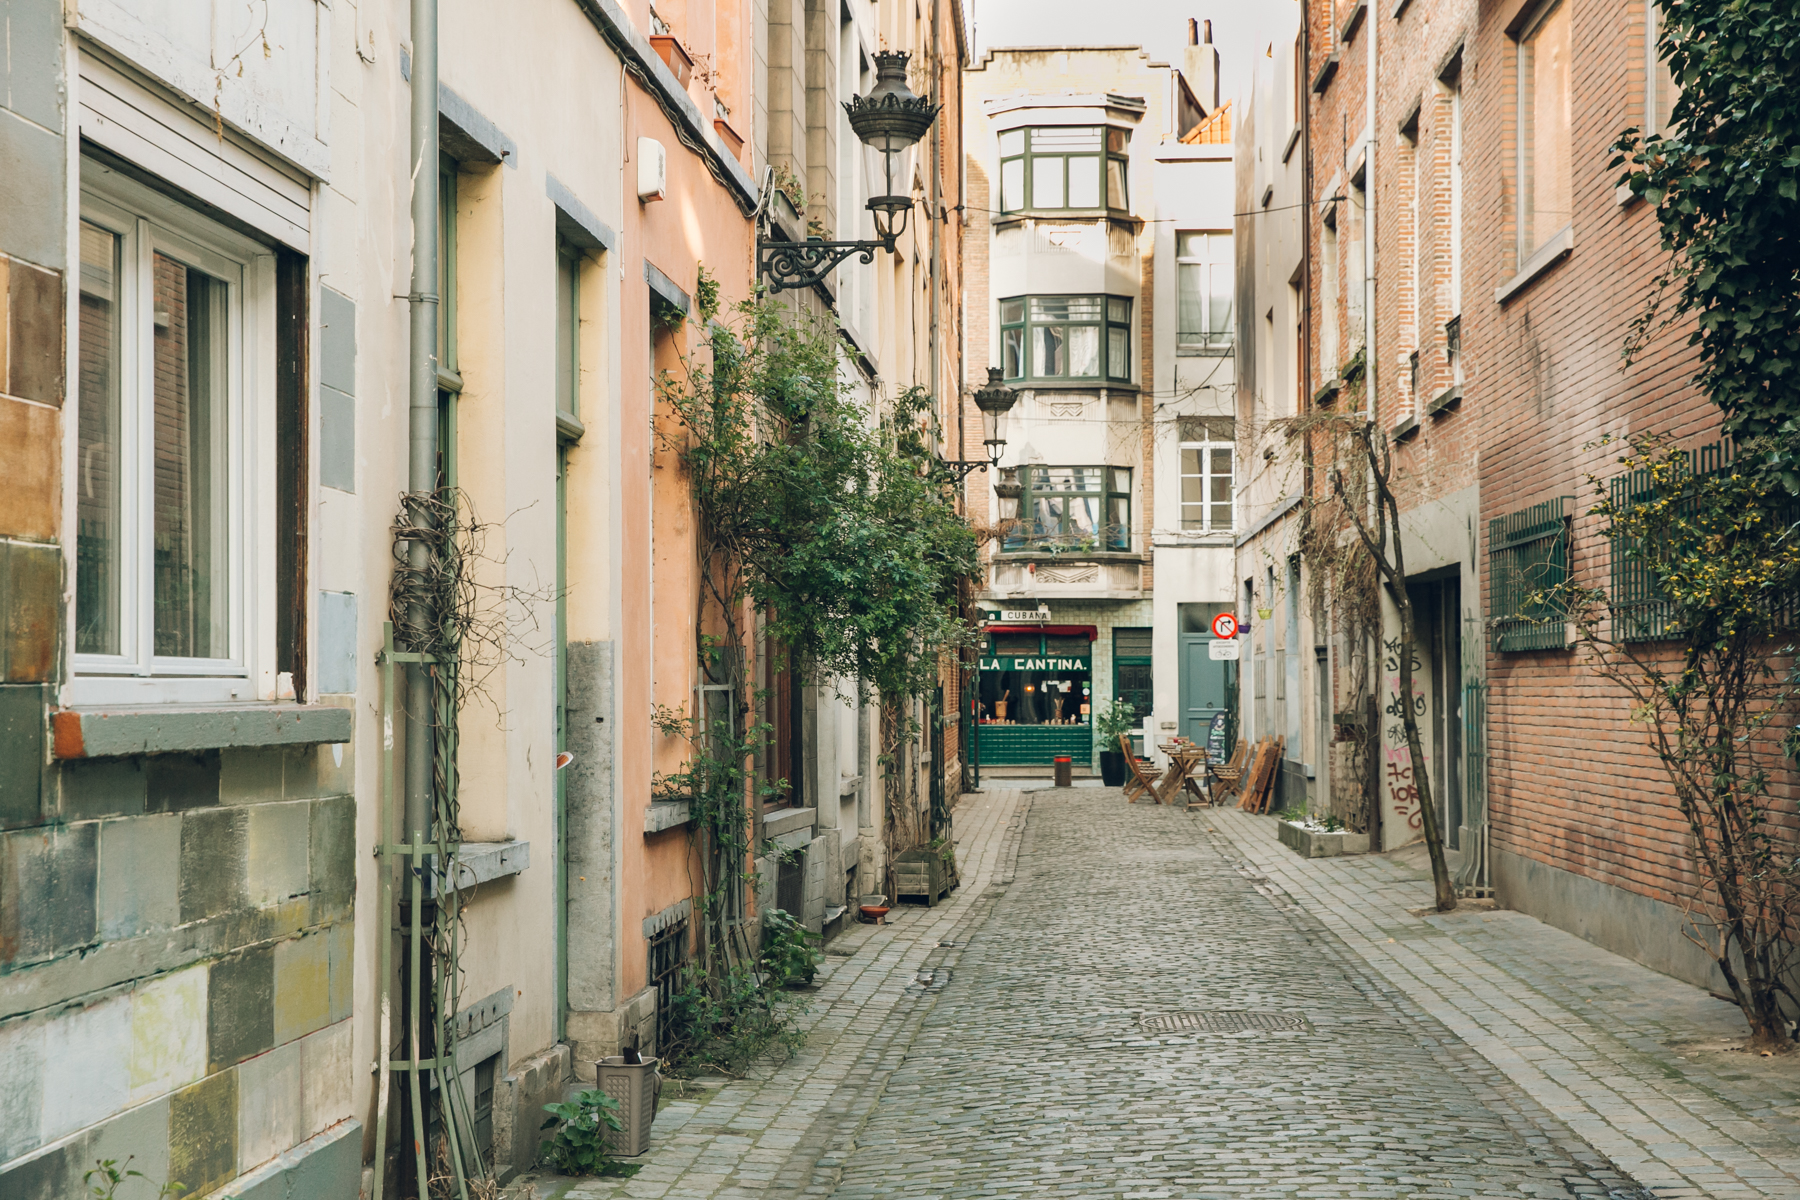 Wandering the side streets in Brussels, Belgium.